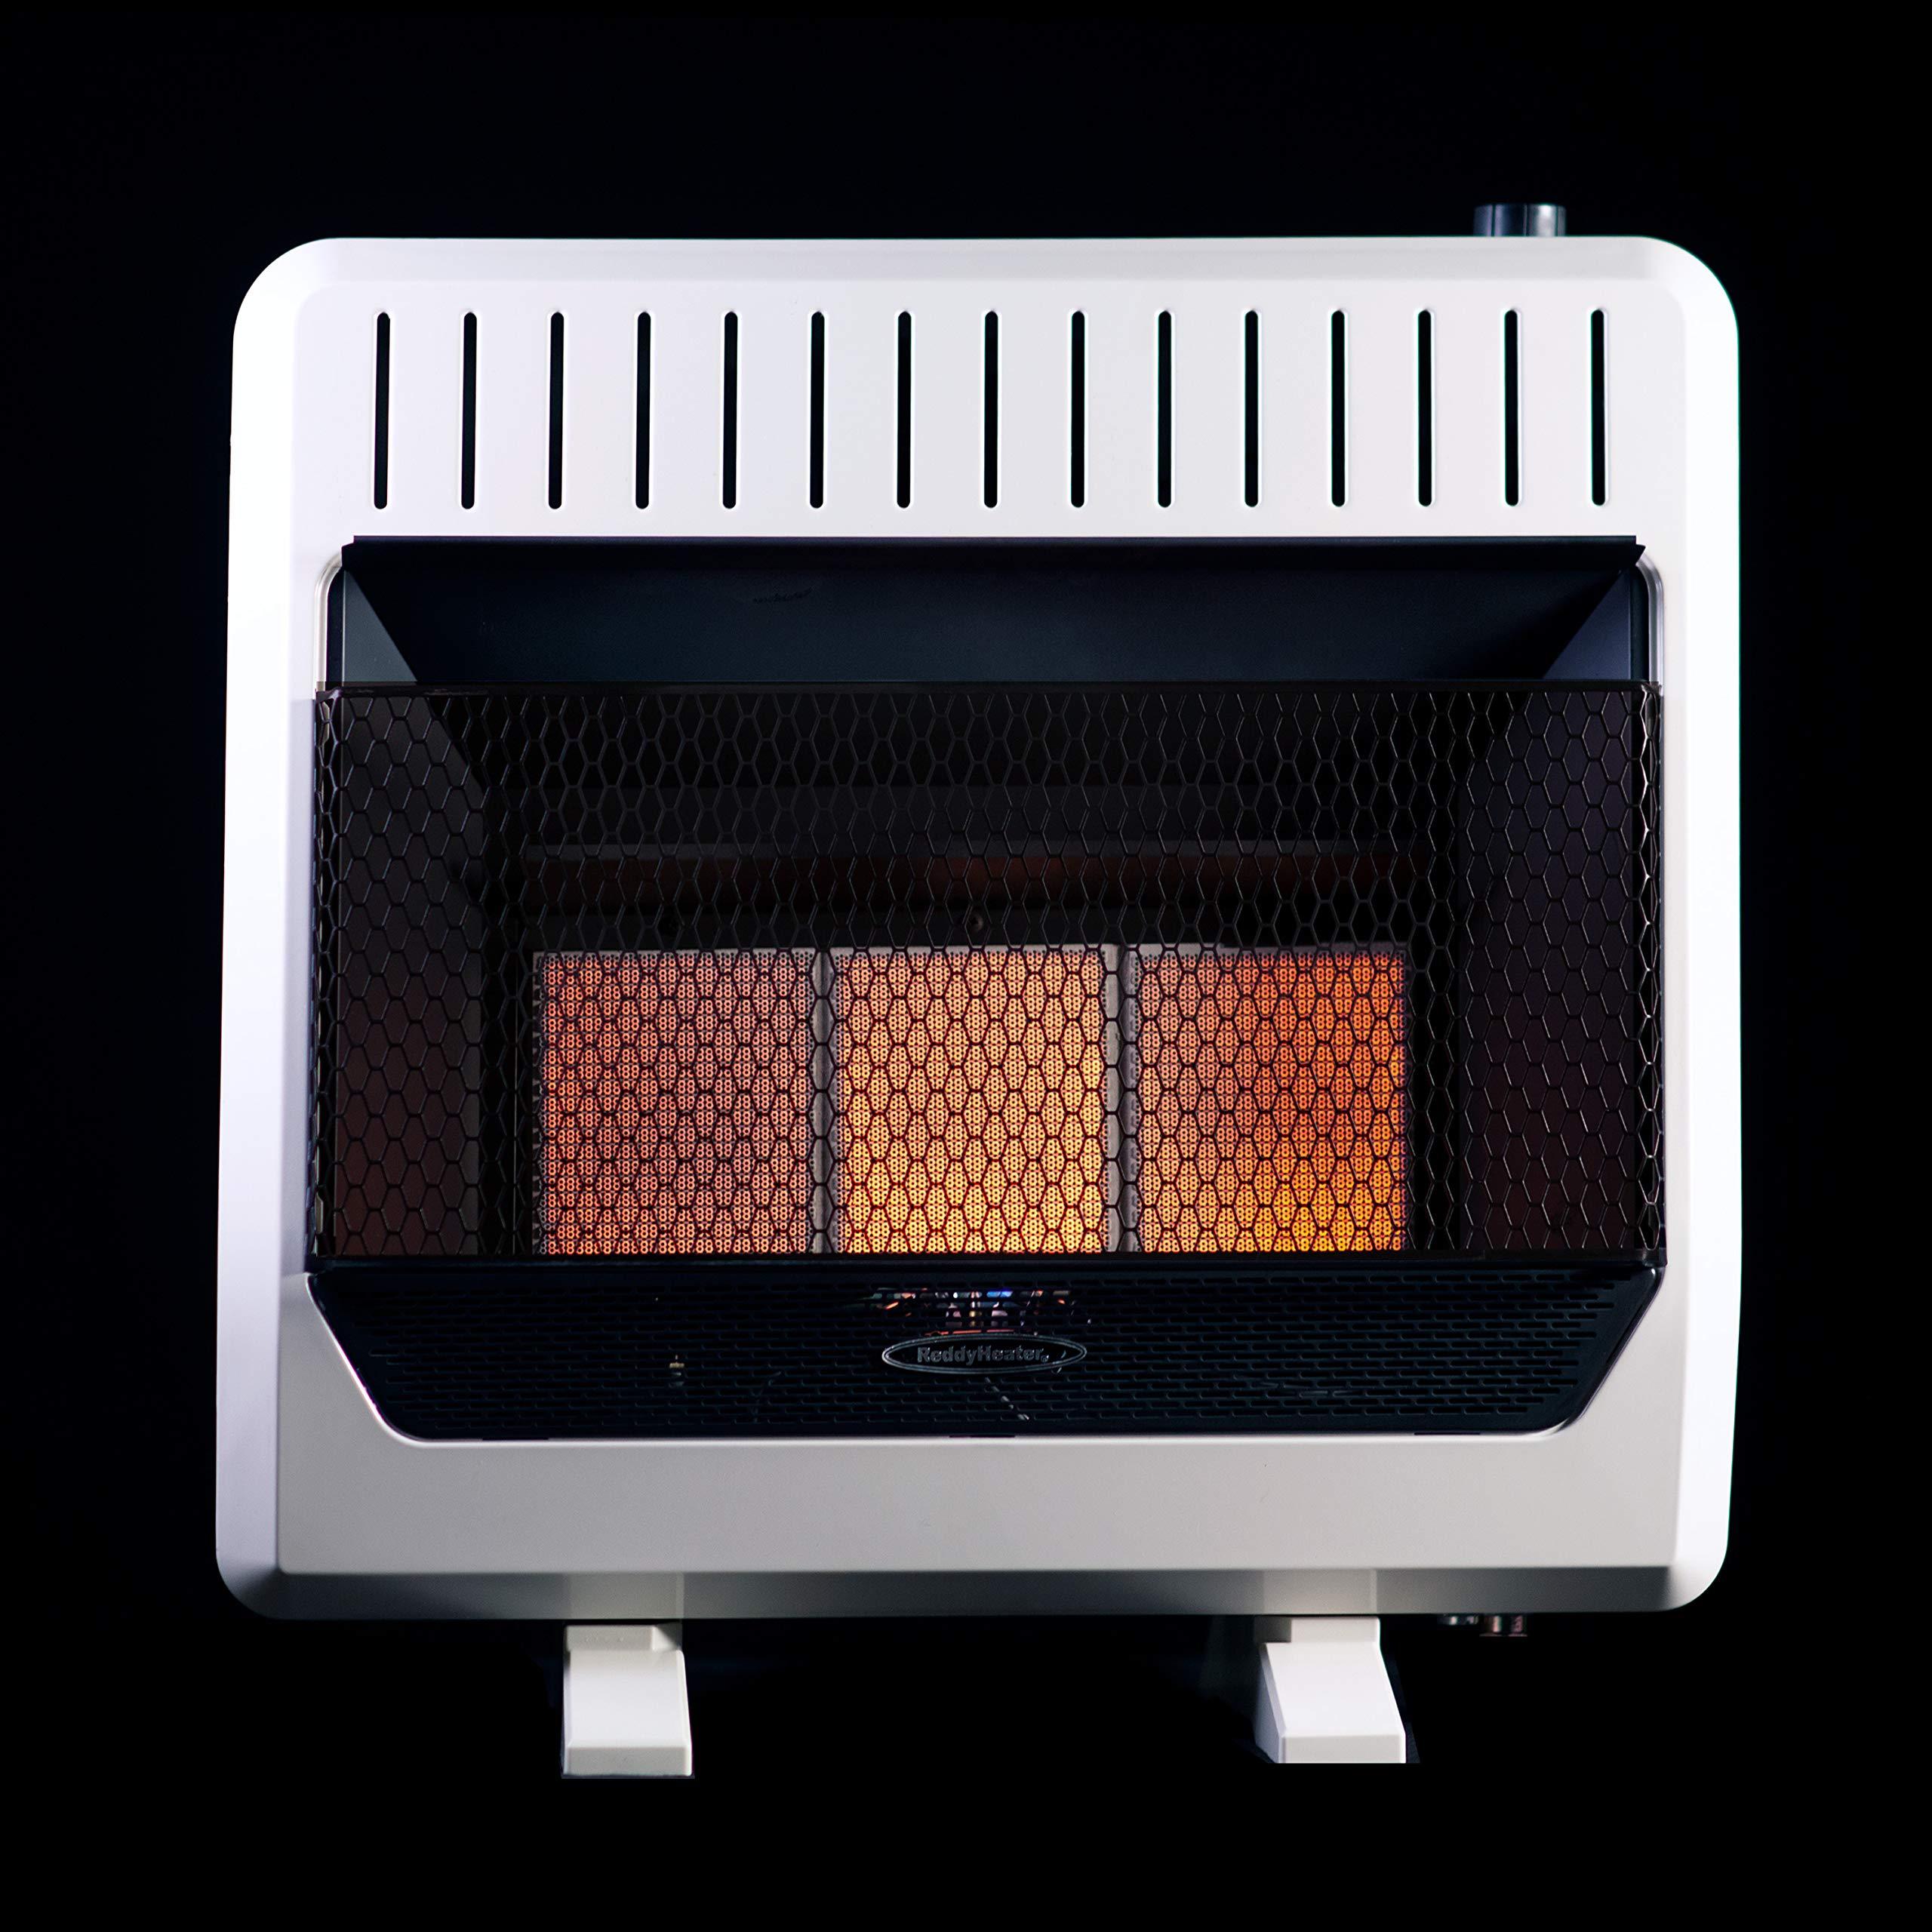 Sure Heat IRH26NLTD Dual Fuel Has 5 Ceramic Plaque IR Wall or Floor Mount Heater, 26K BTU, Beige/Tan by Sure Heat